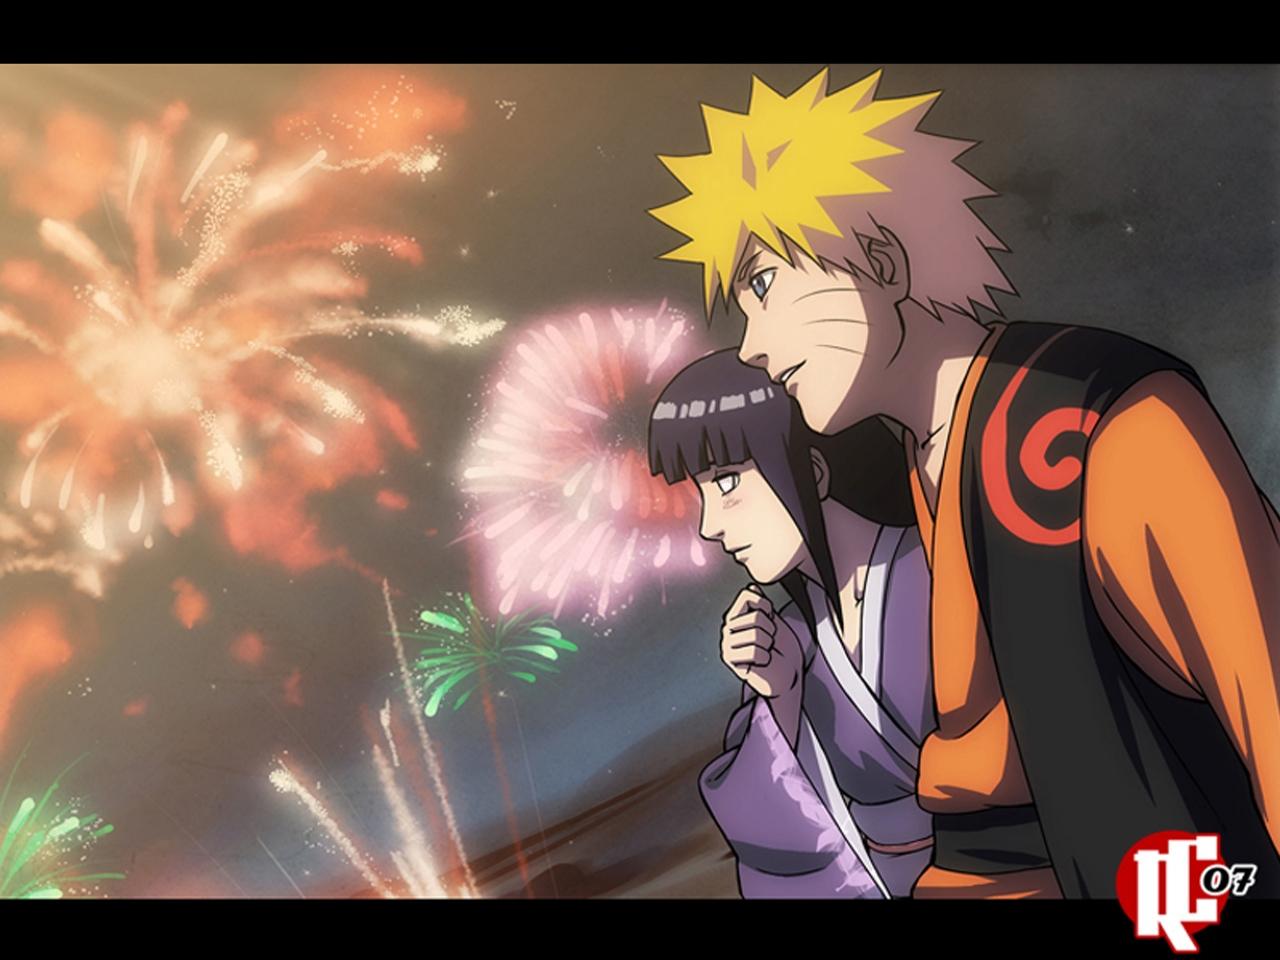 Hd naruto wallpapers - Naruto images and wallpapers ...